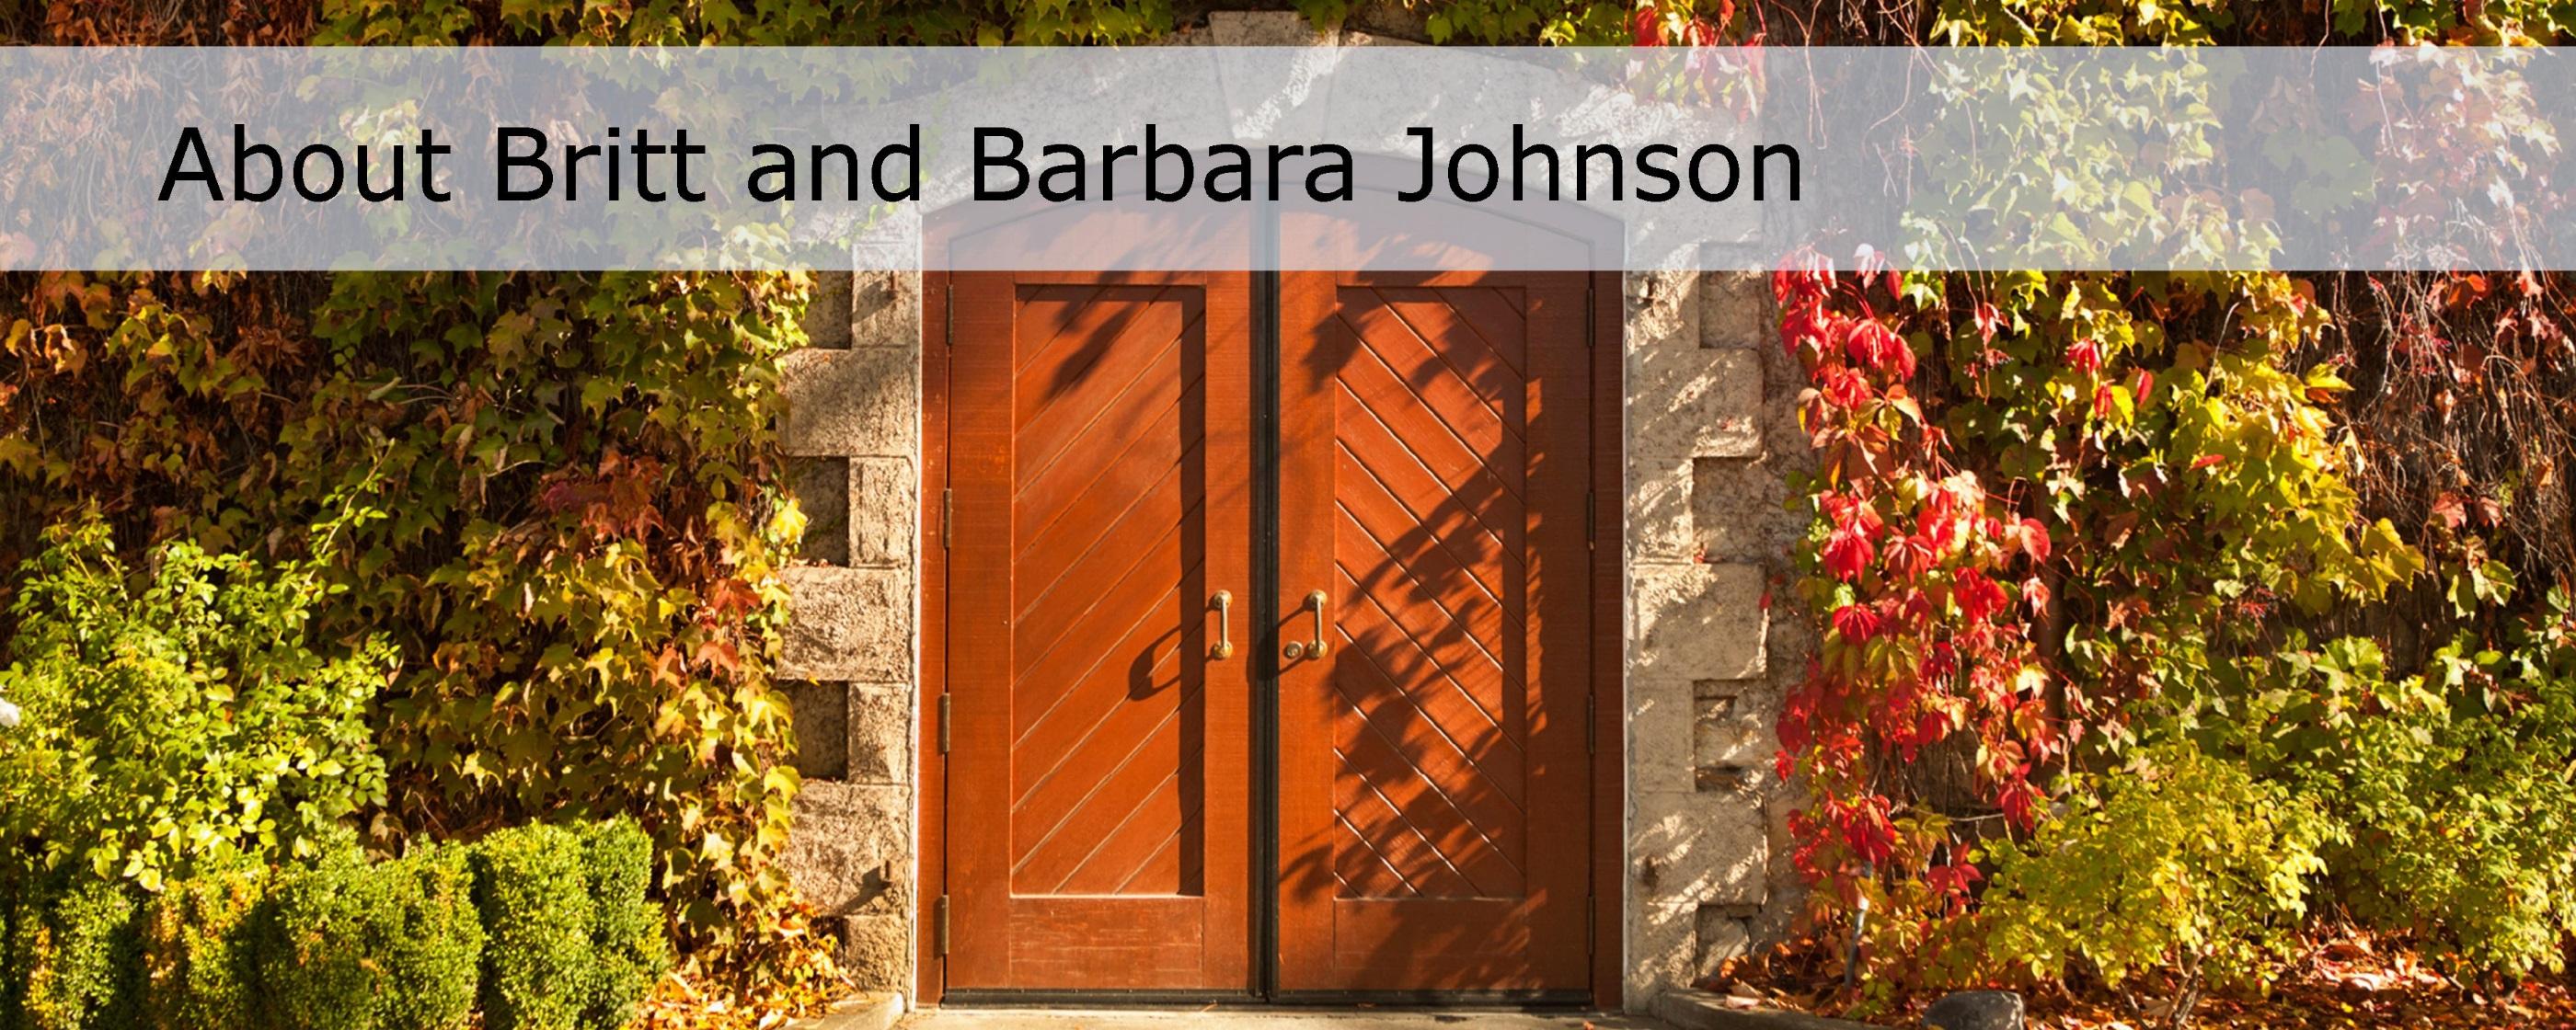 about britt and barbara johnson